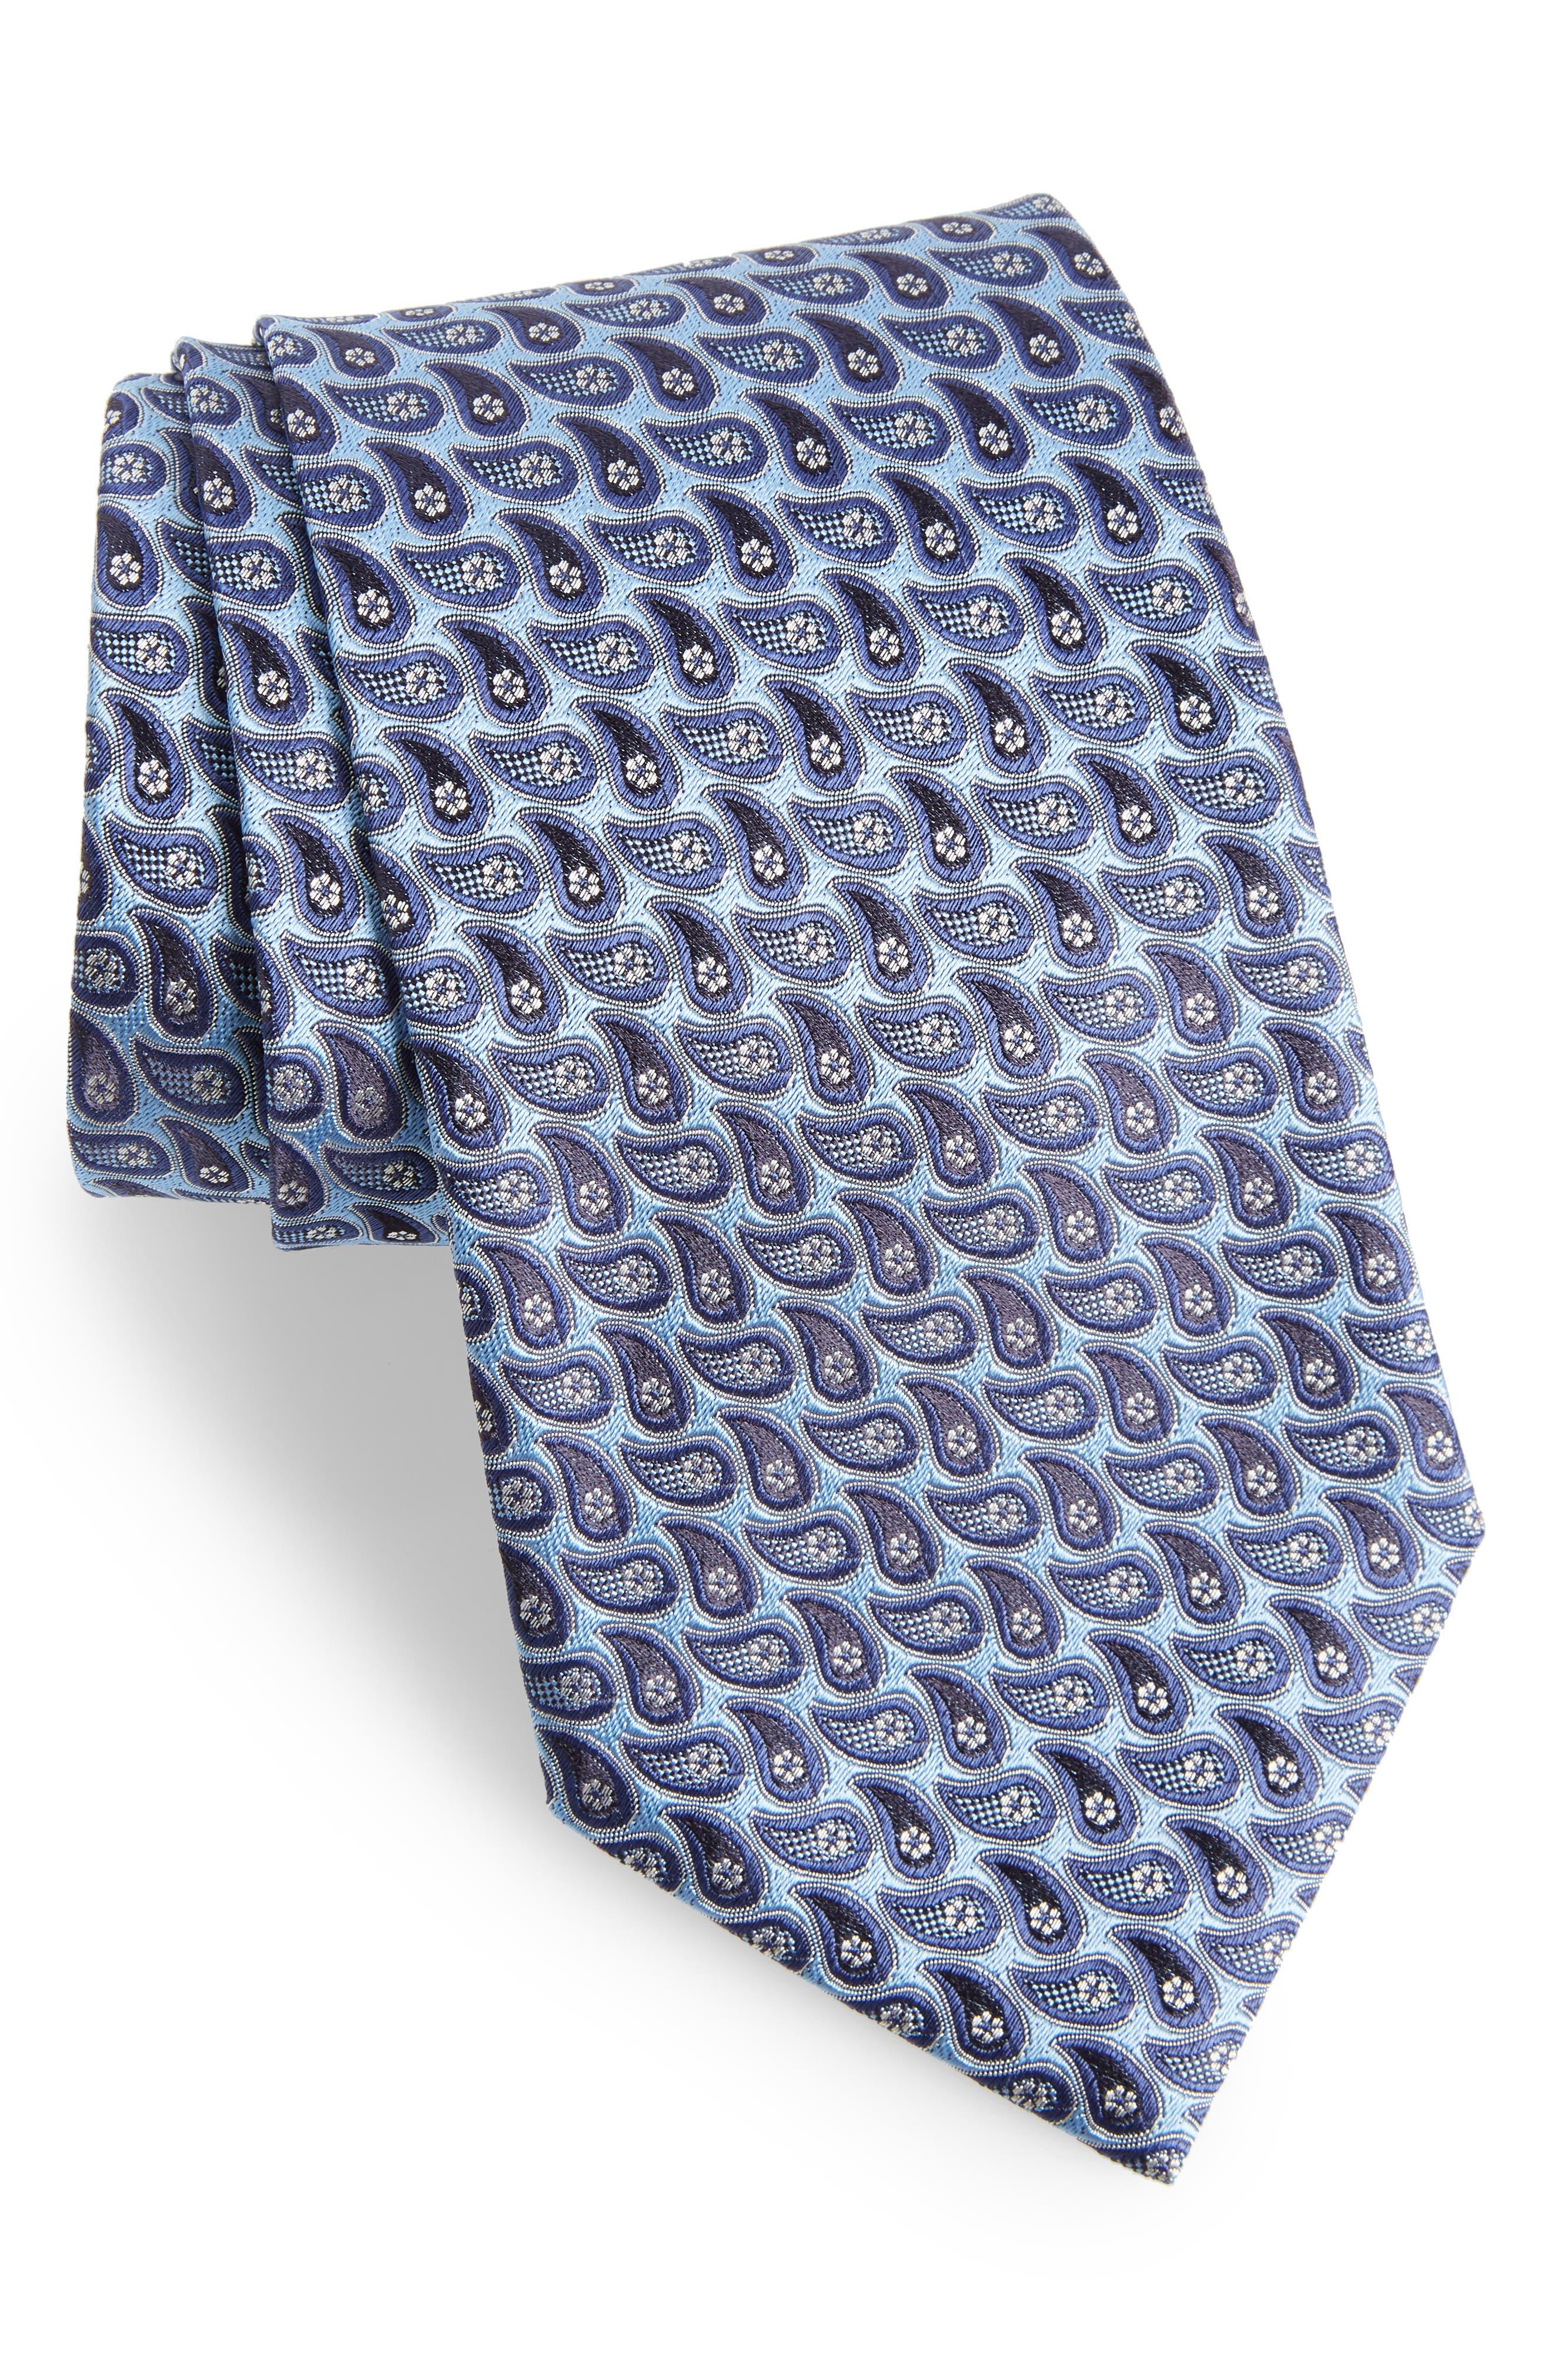 ERMENEGILDO ZEGNA, Geometric Paisley Silk Tie, Main thumbnail 1, color, BLUE